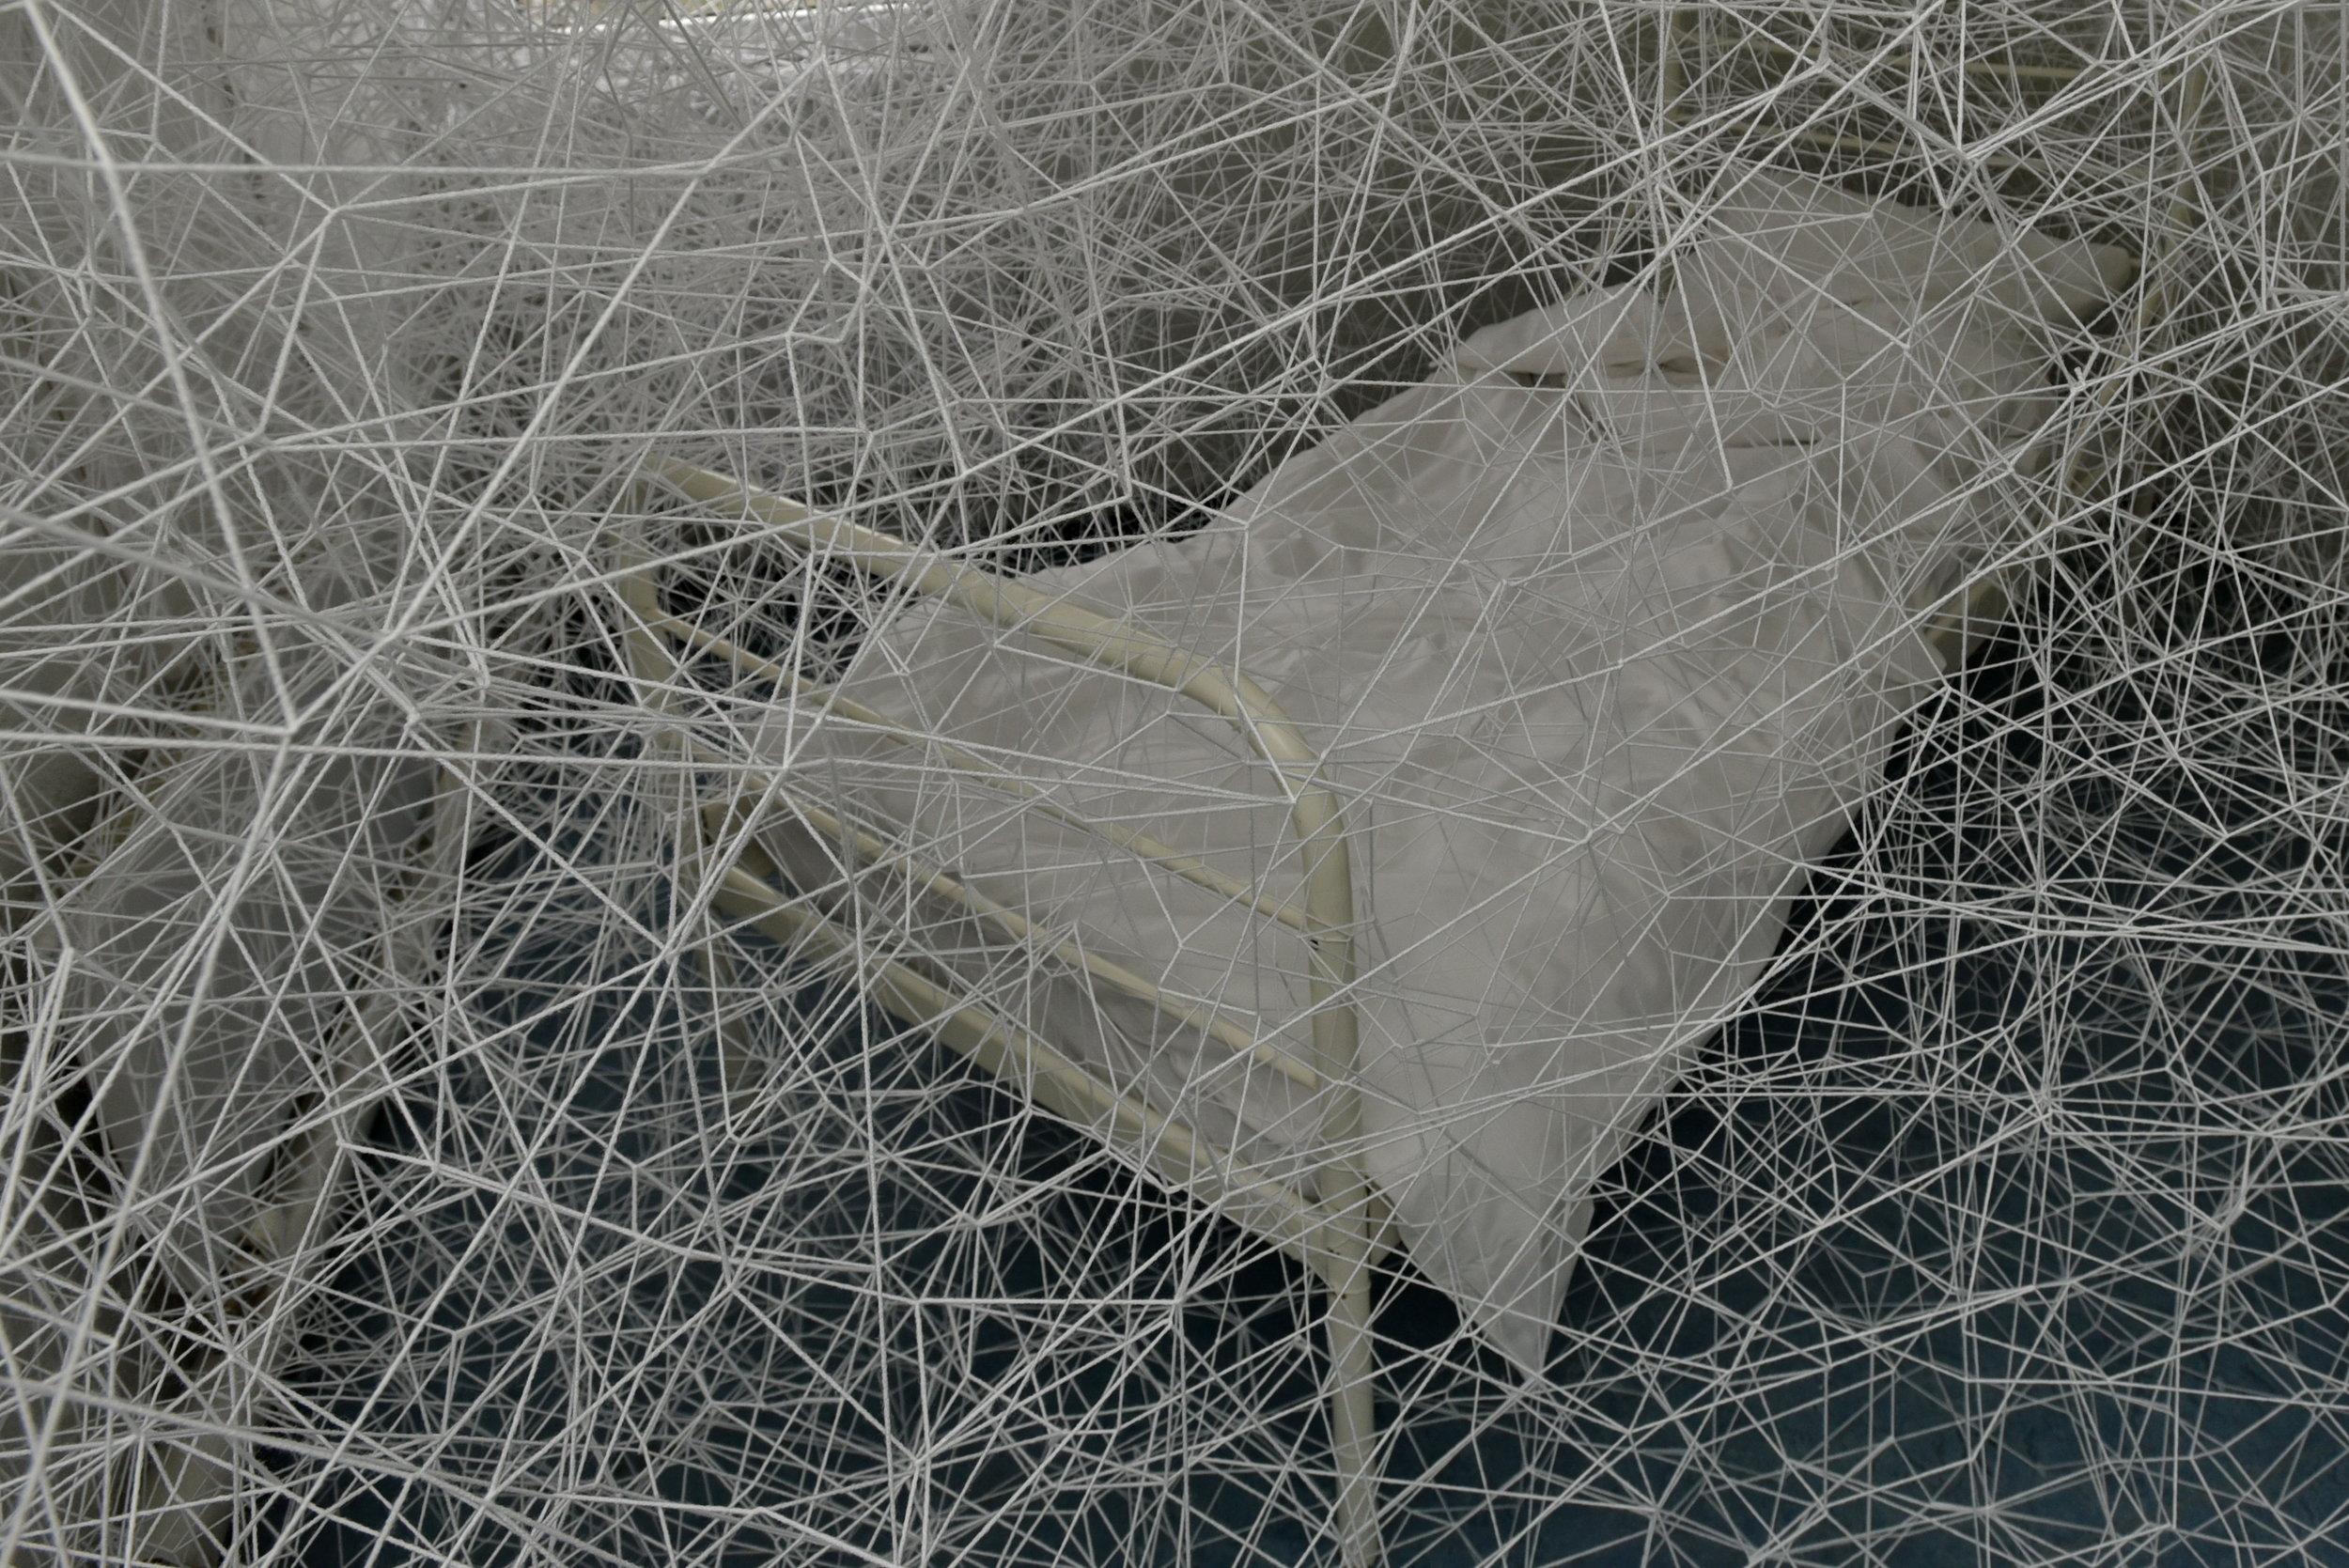 2017_During Sleep, Herning Biennale, Denmark, cortesy of the artist_05.JPG